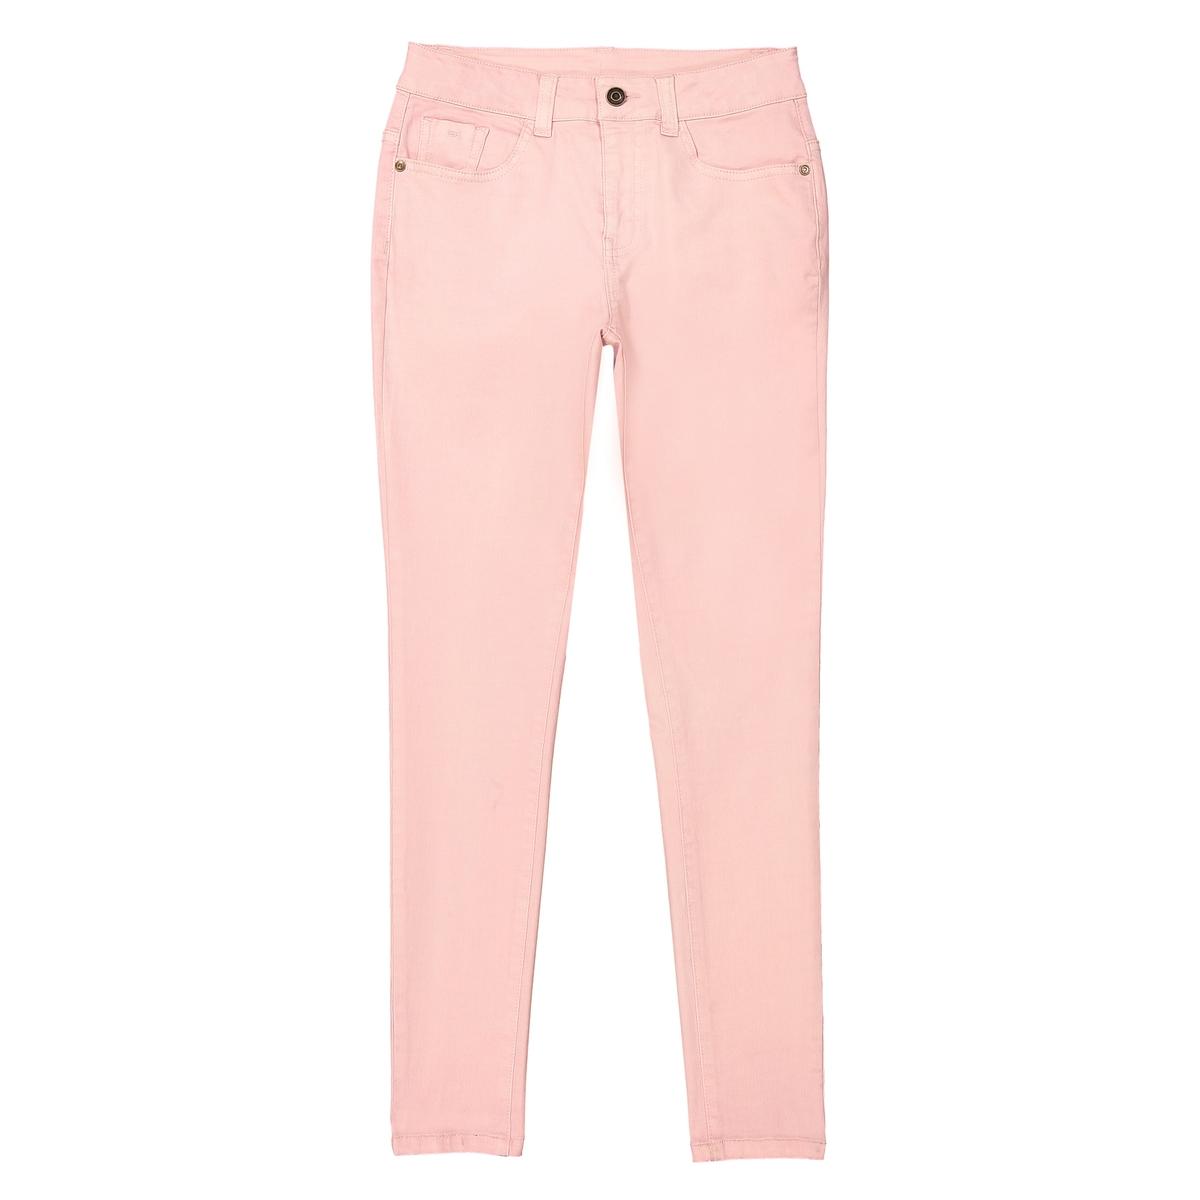 skinny trousers, 10-16 years